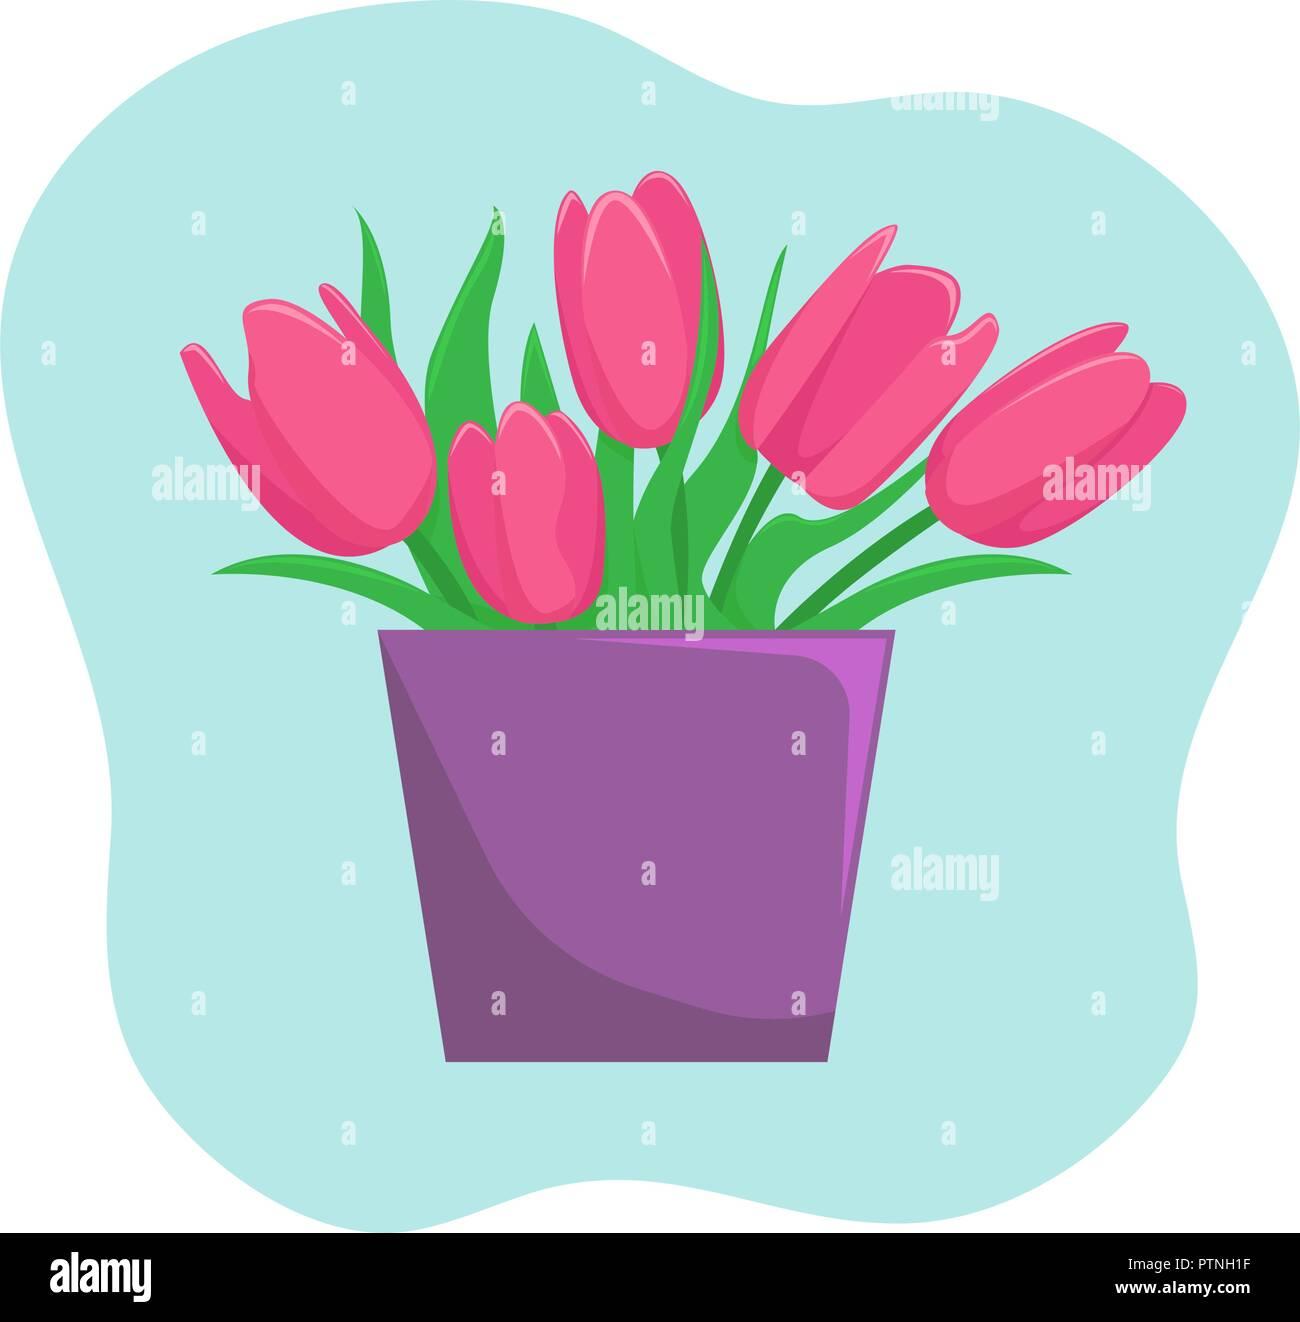 Bouquet Spring Flowers Cartoon Icon Stock Photos Bouquet Spring